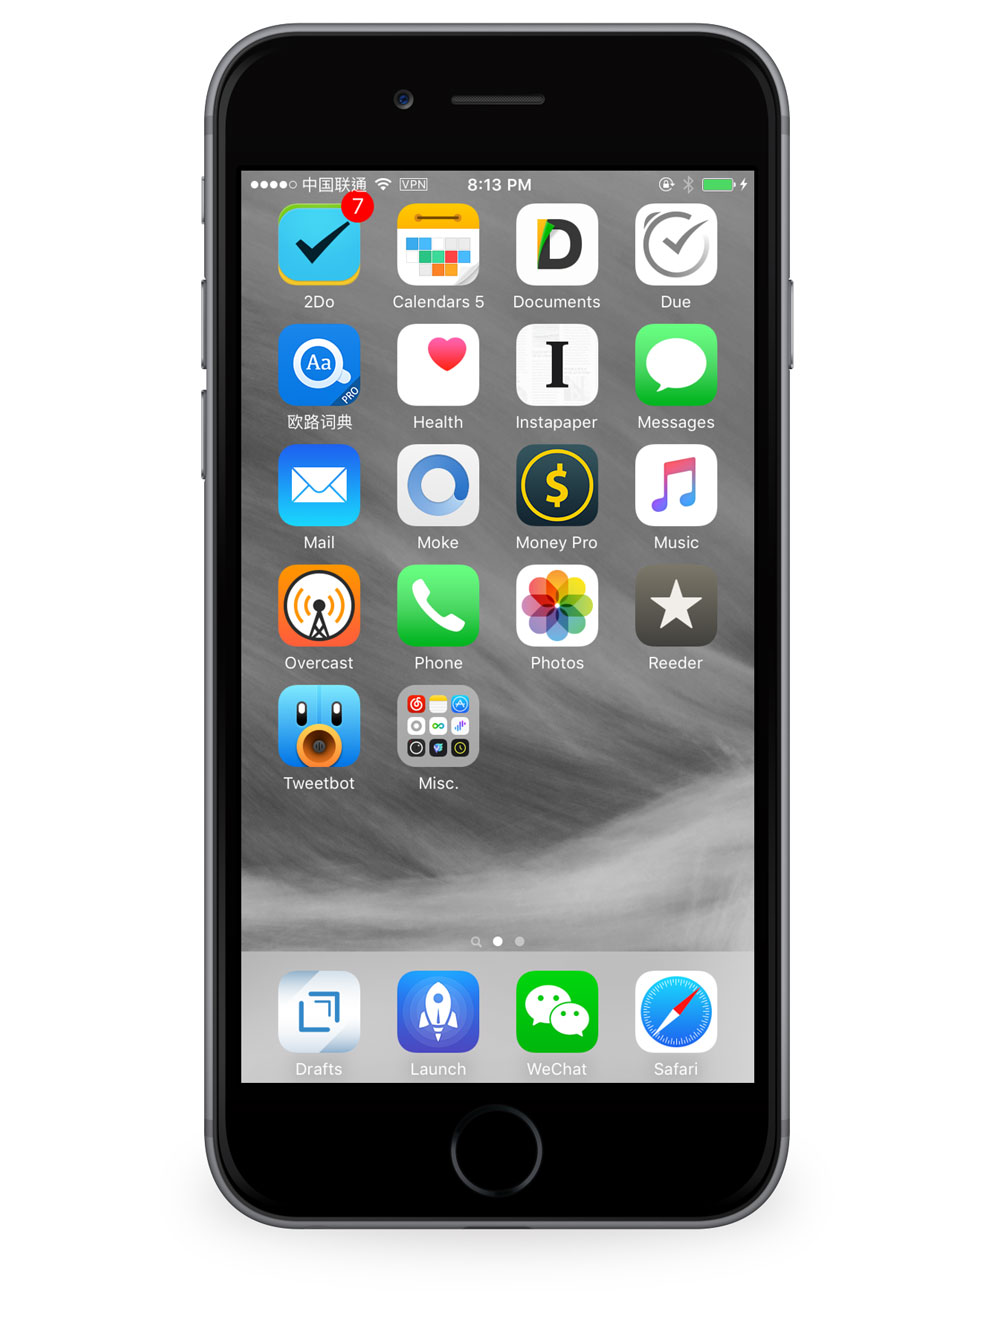 Chenyang Hsu's iPhone